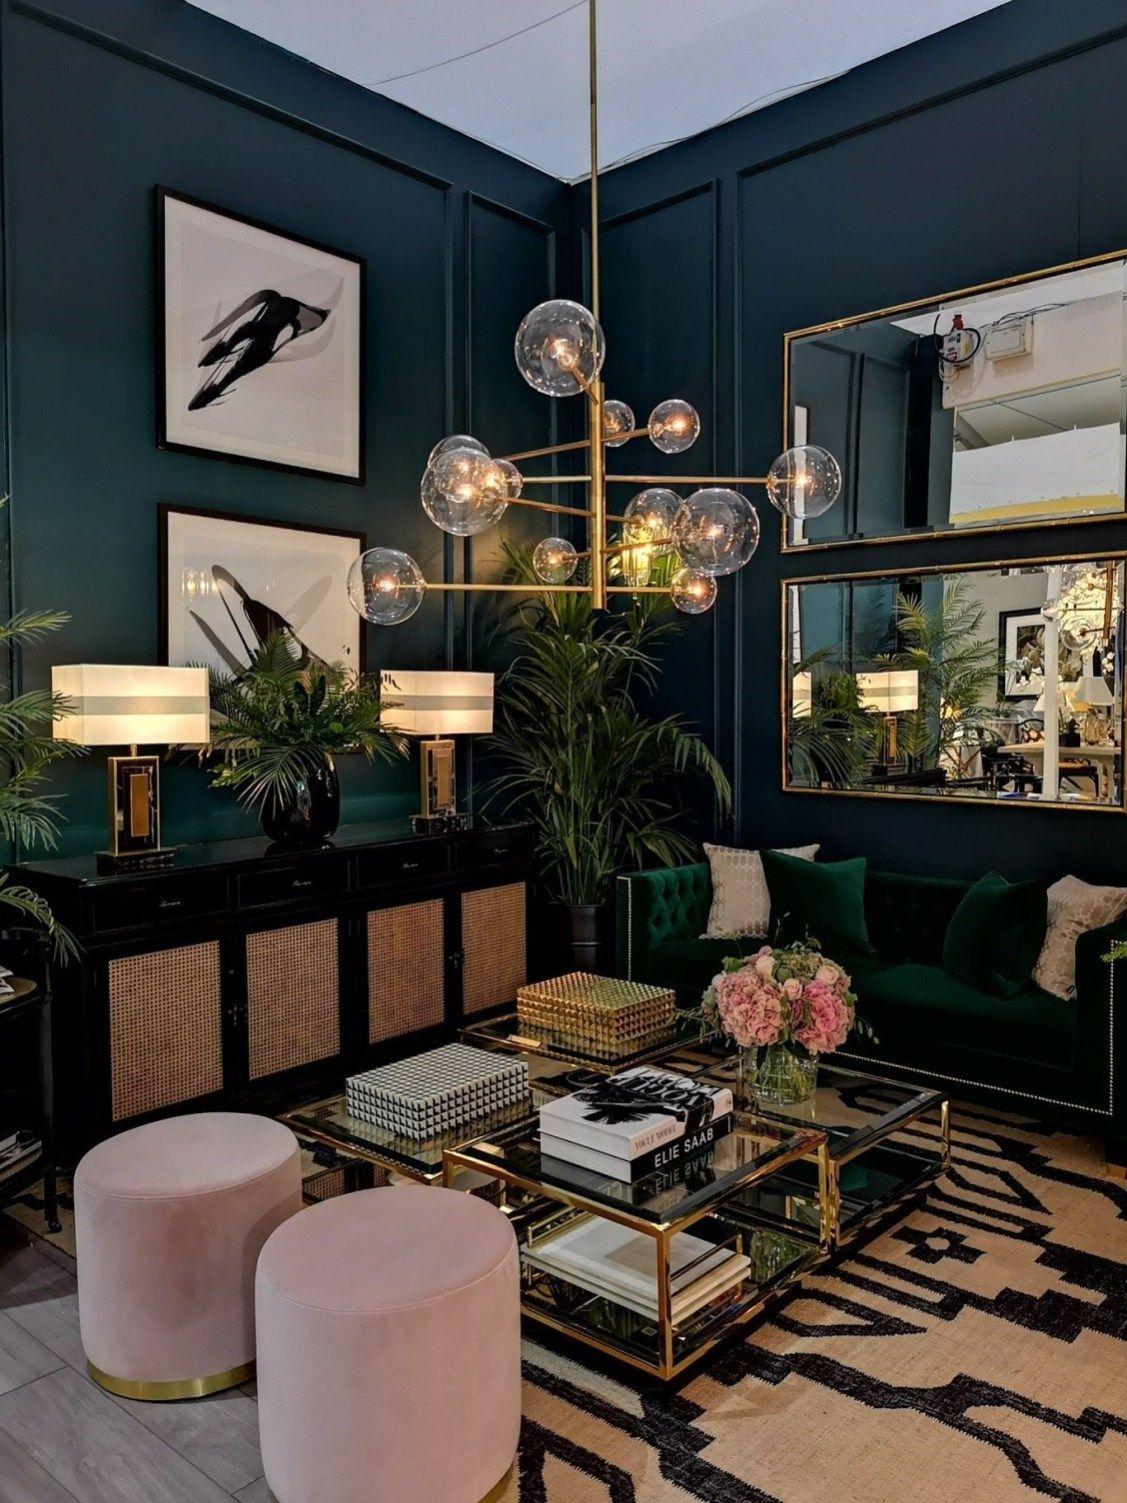 Elegant Home Design Ideas Uk 3 Living Room Decor Modern House Interior Decor